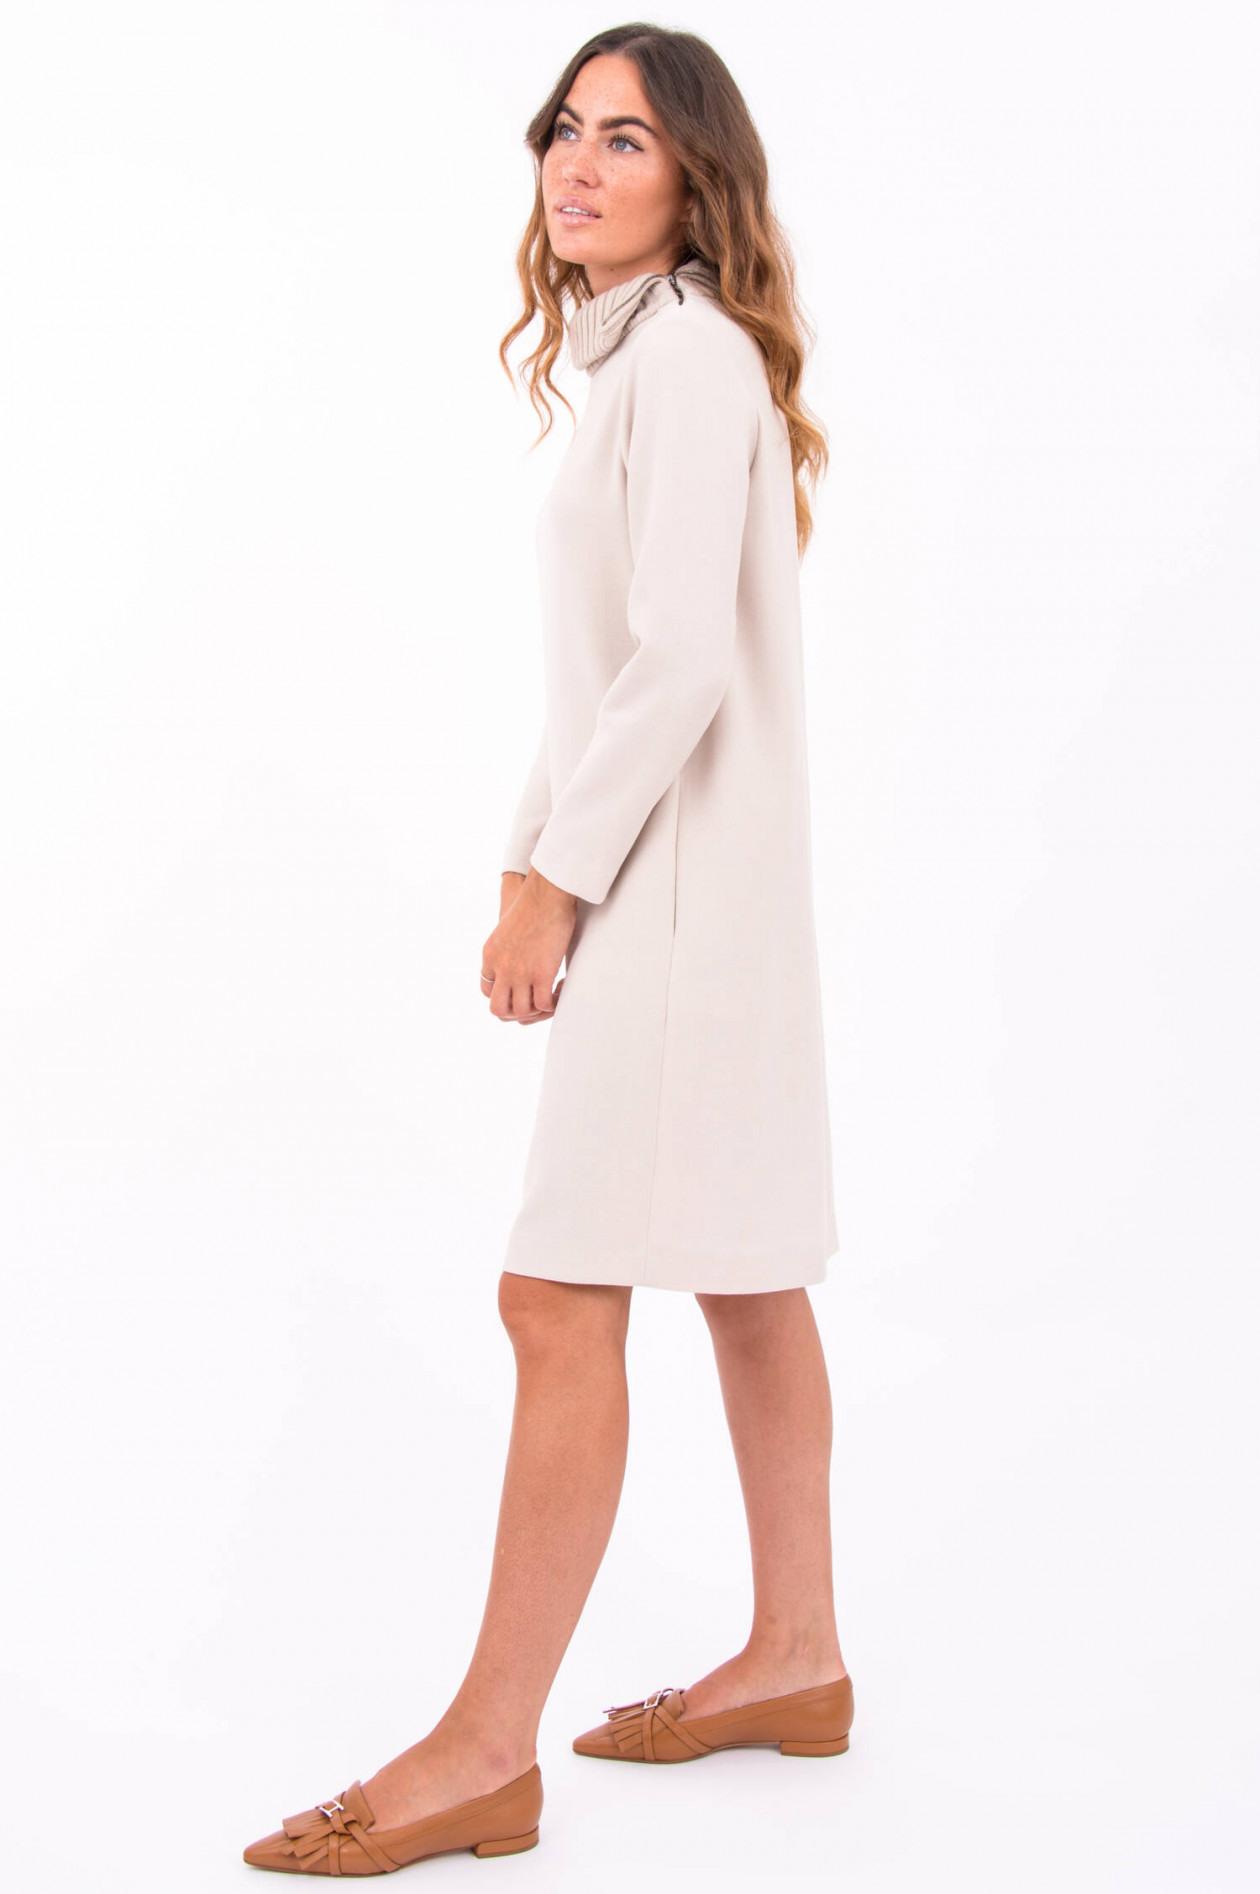 Antonelli Firenze Kleid Mondrian In Hellbeige  Gruenerat